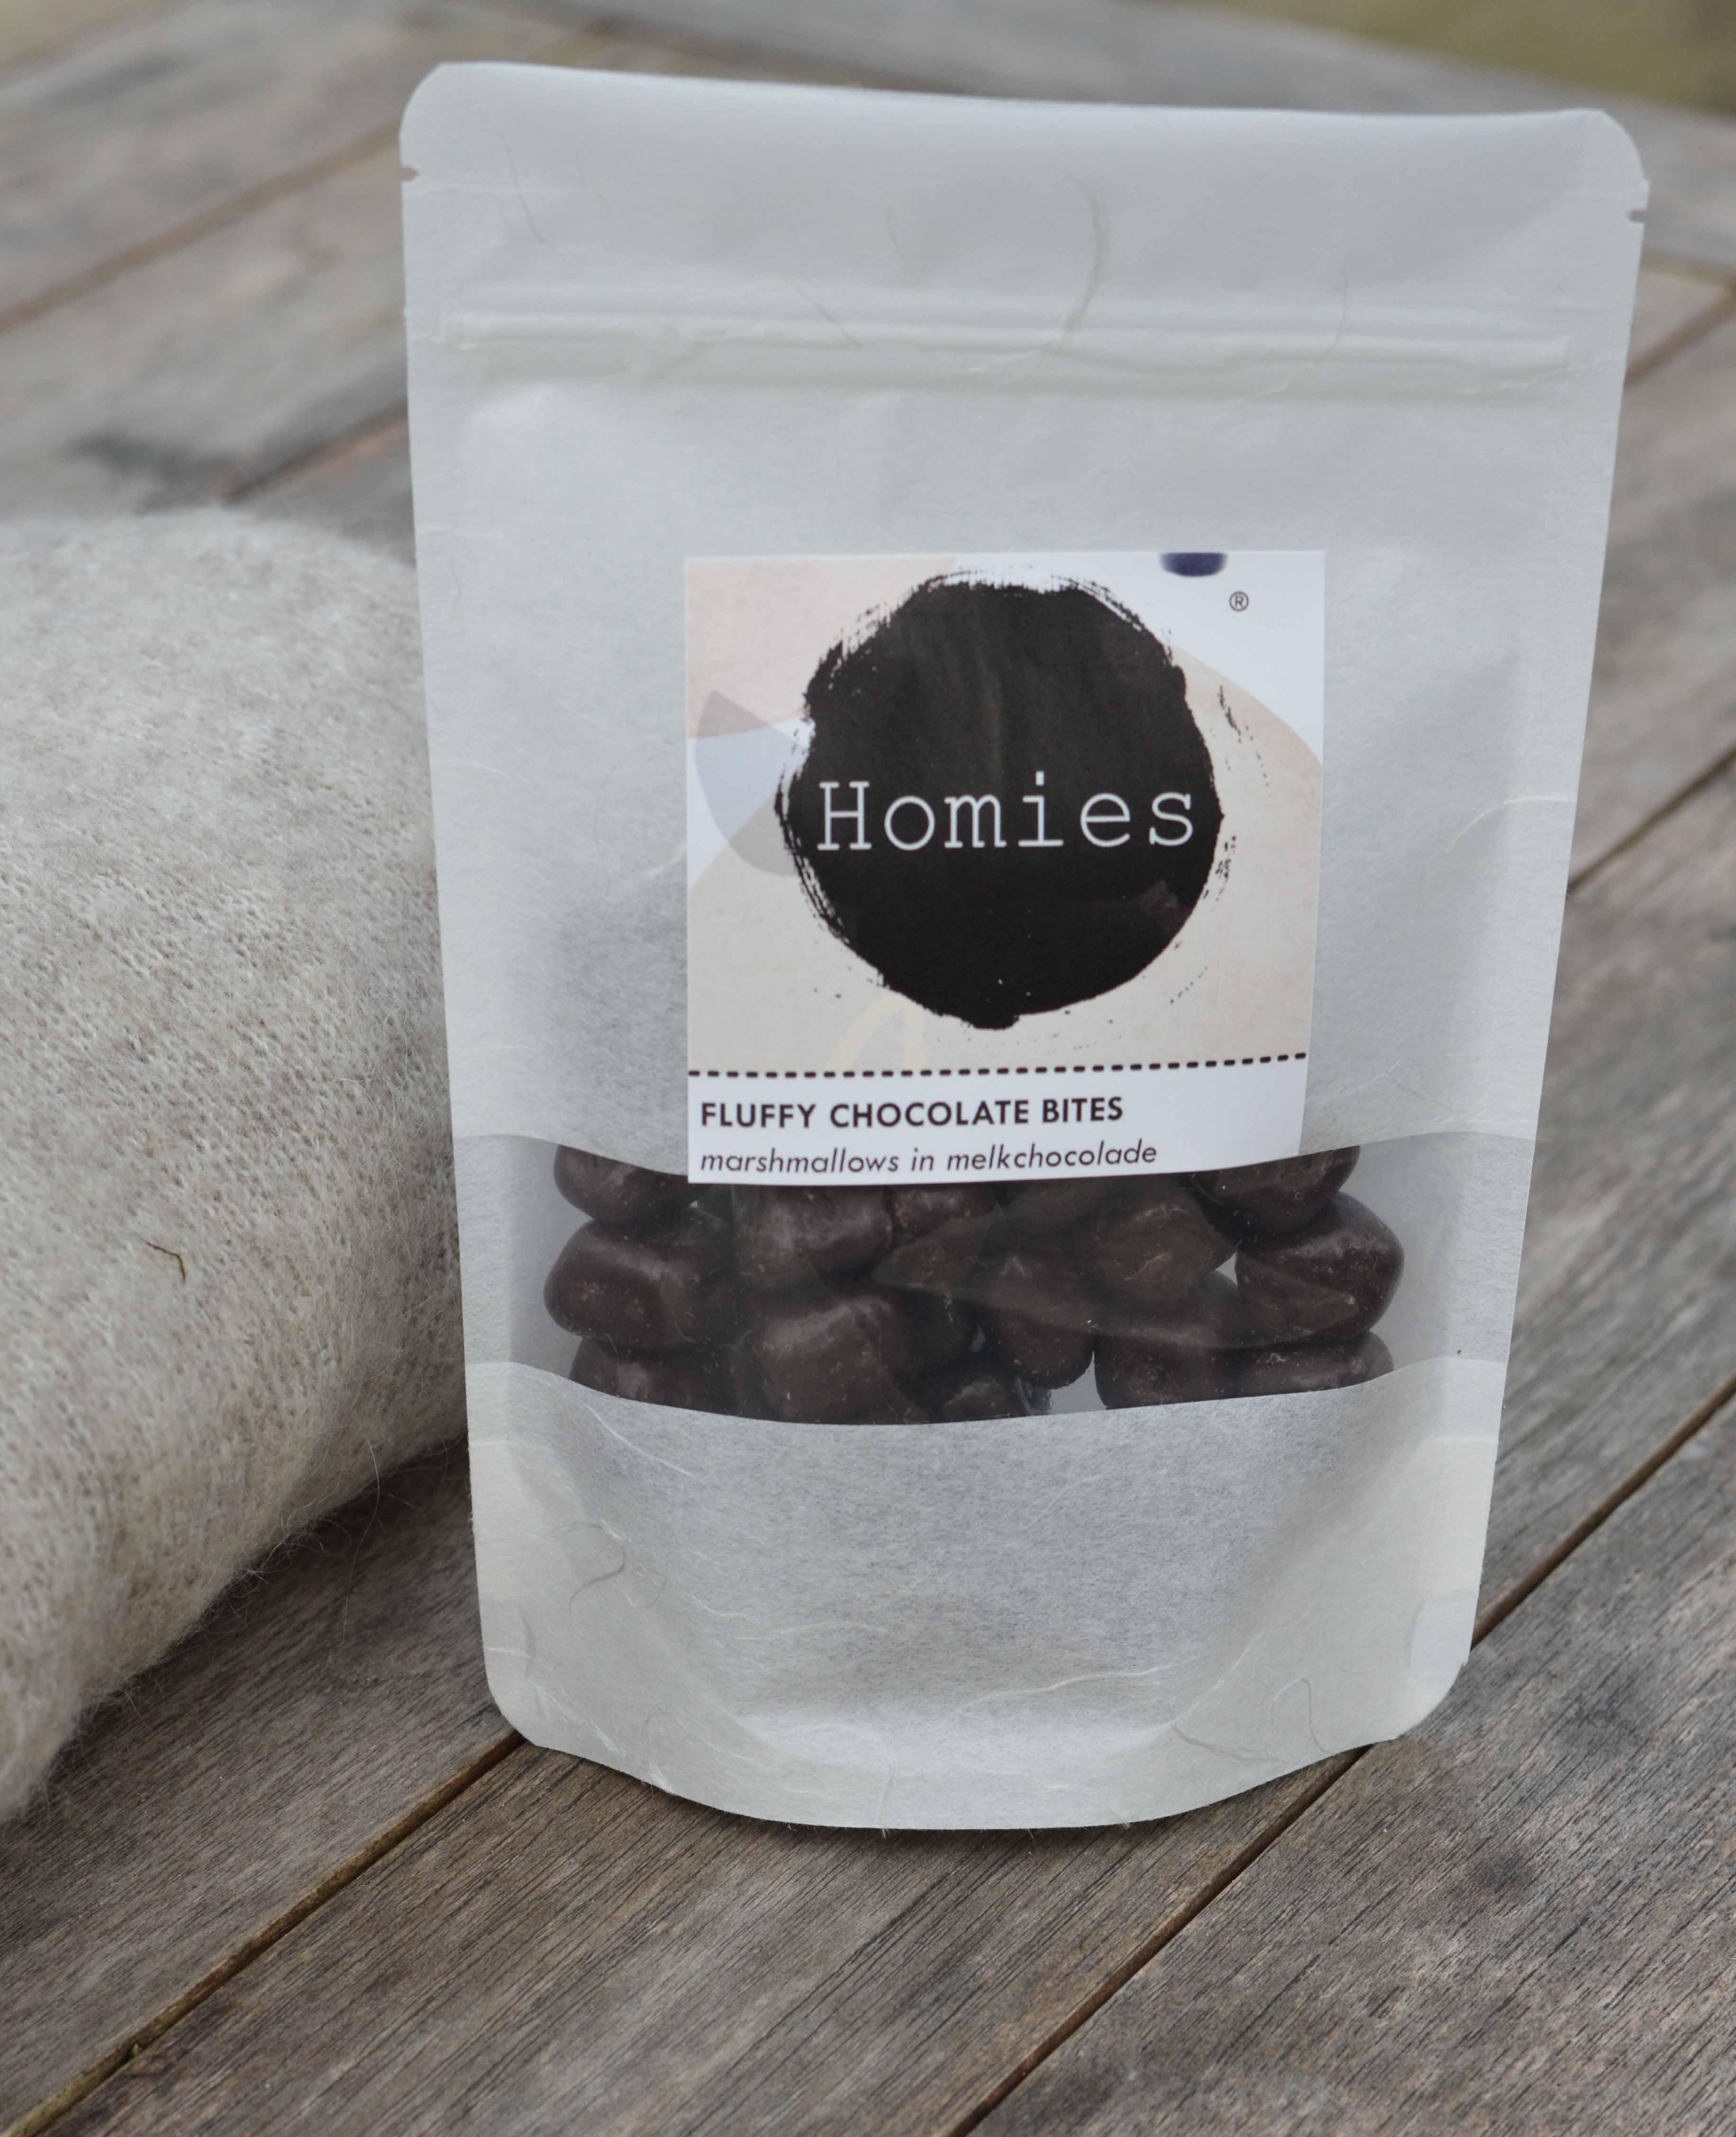 Fluffy Chocolate Bites